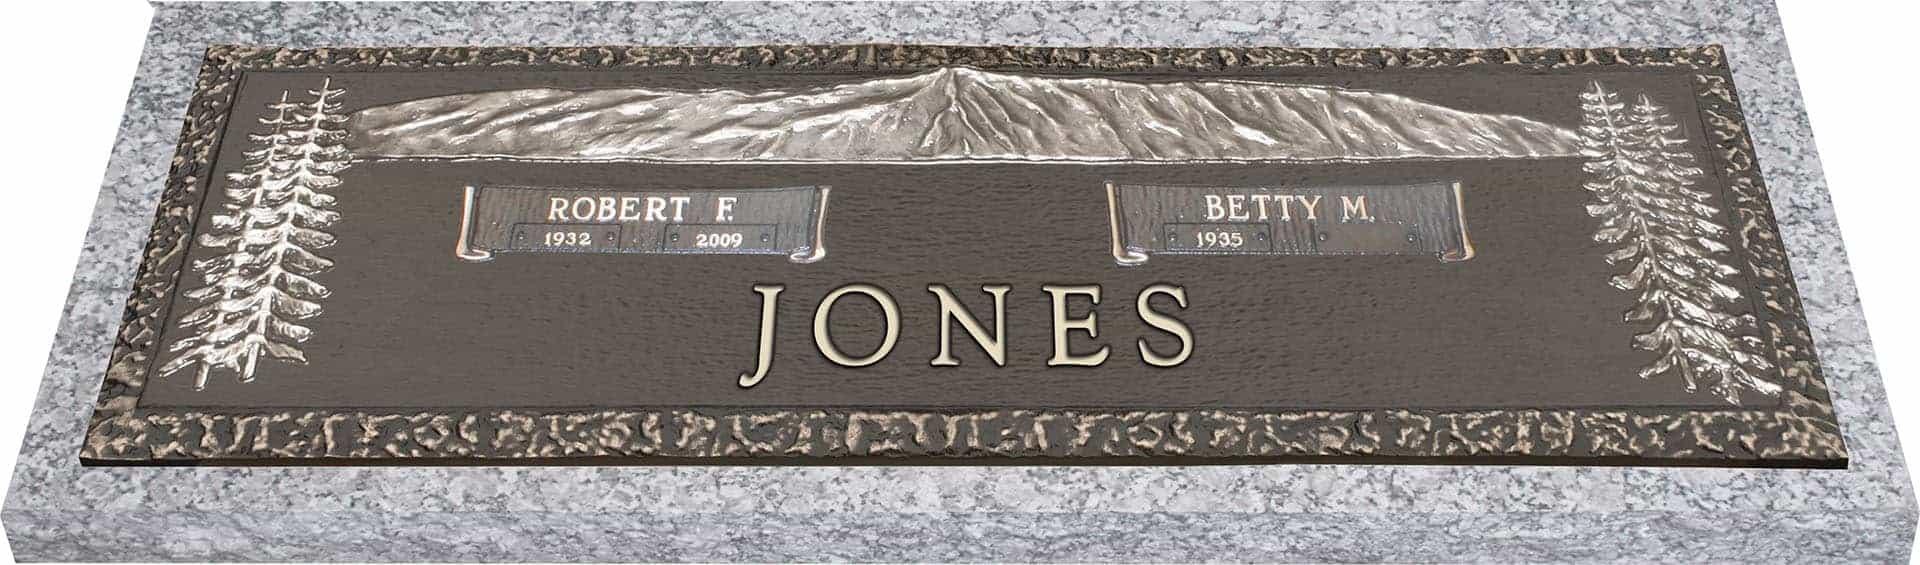 bronze headstone 44x14 companion honor life Gravestone Clip Art Headstone Tombstone Clip Art